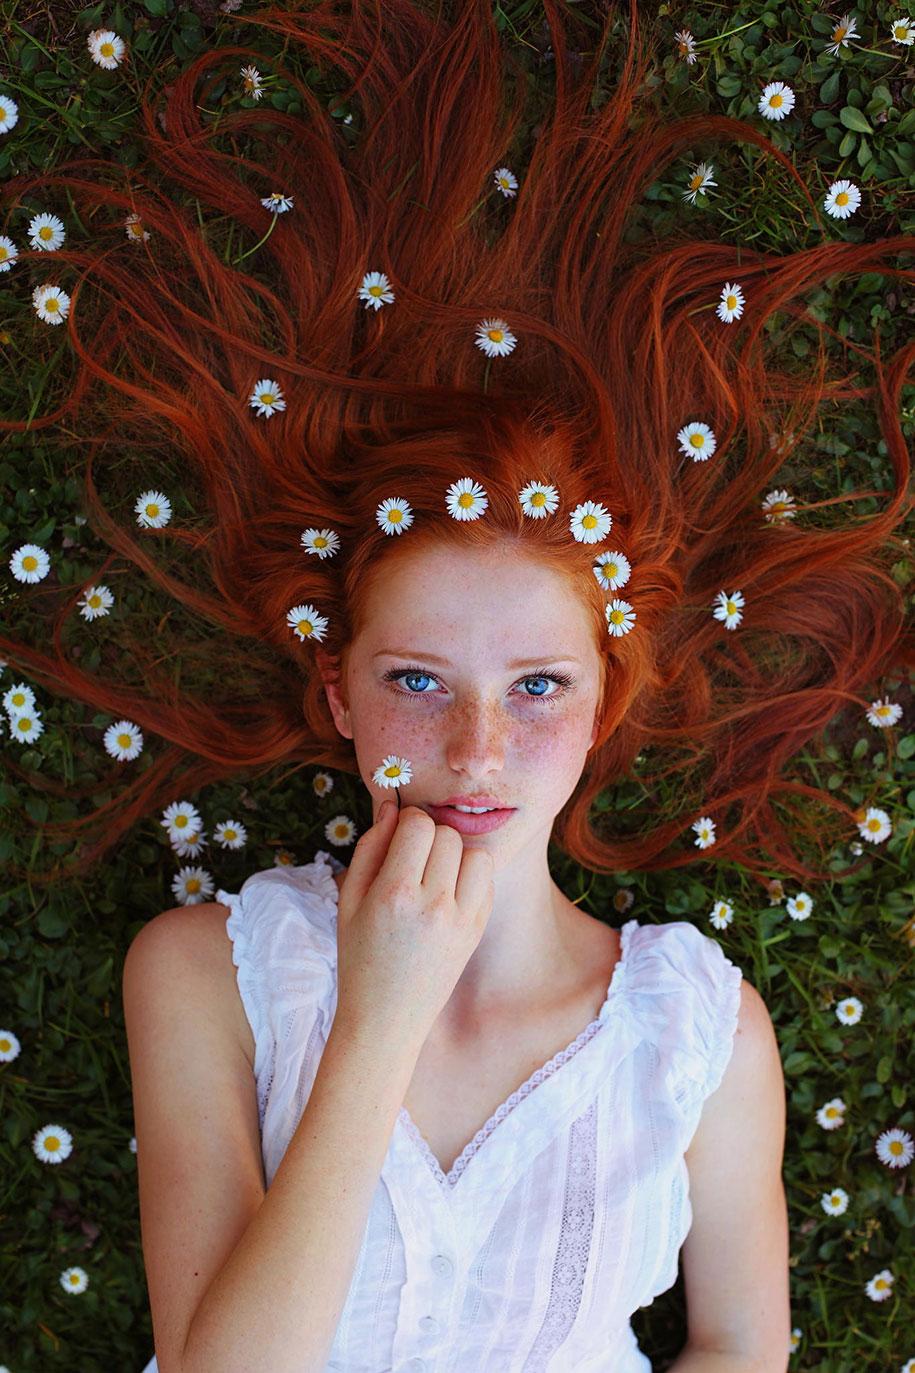 redhead-women-portraits-maja-topcagic-bosnia-herzegovina-4